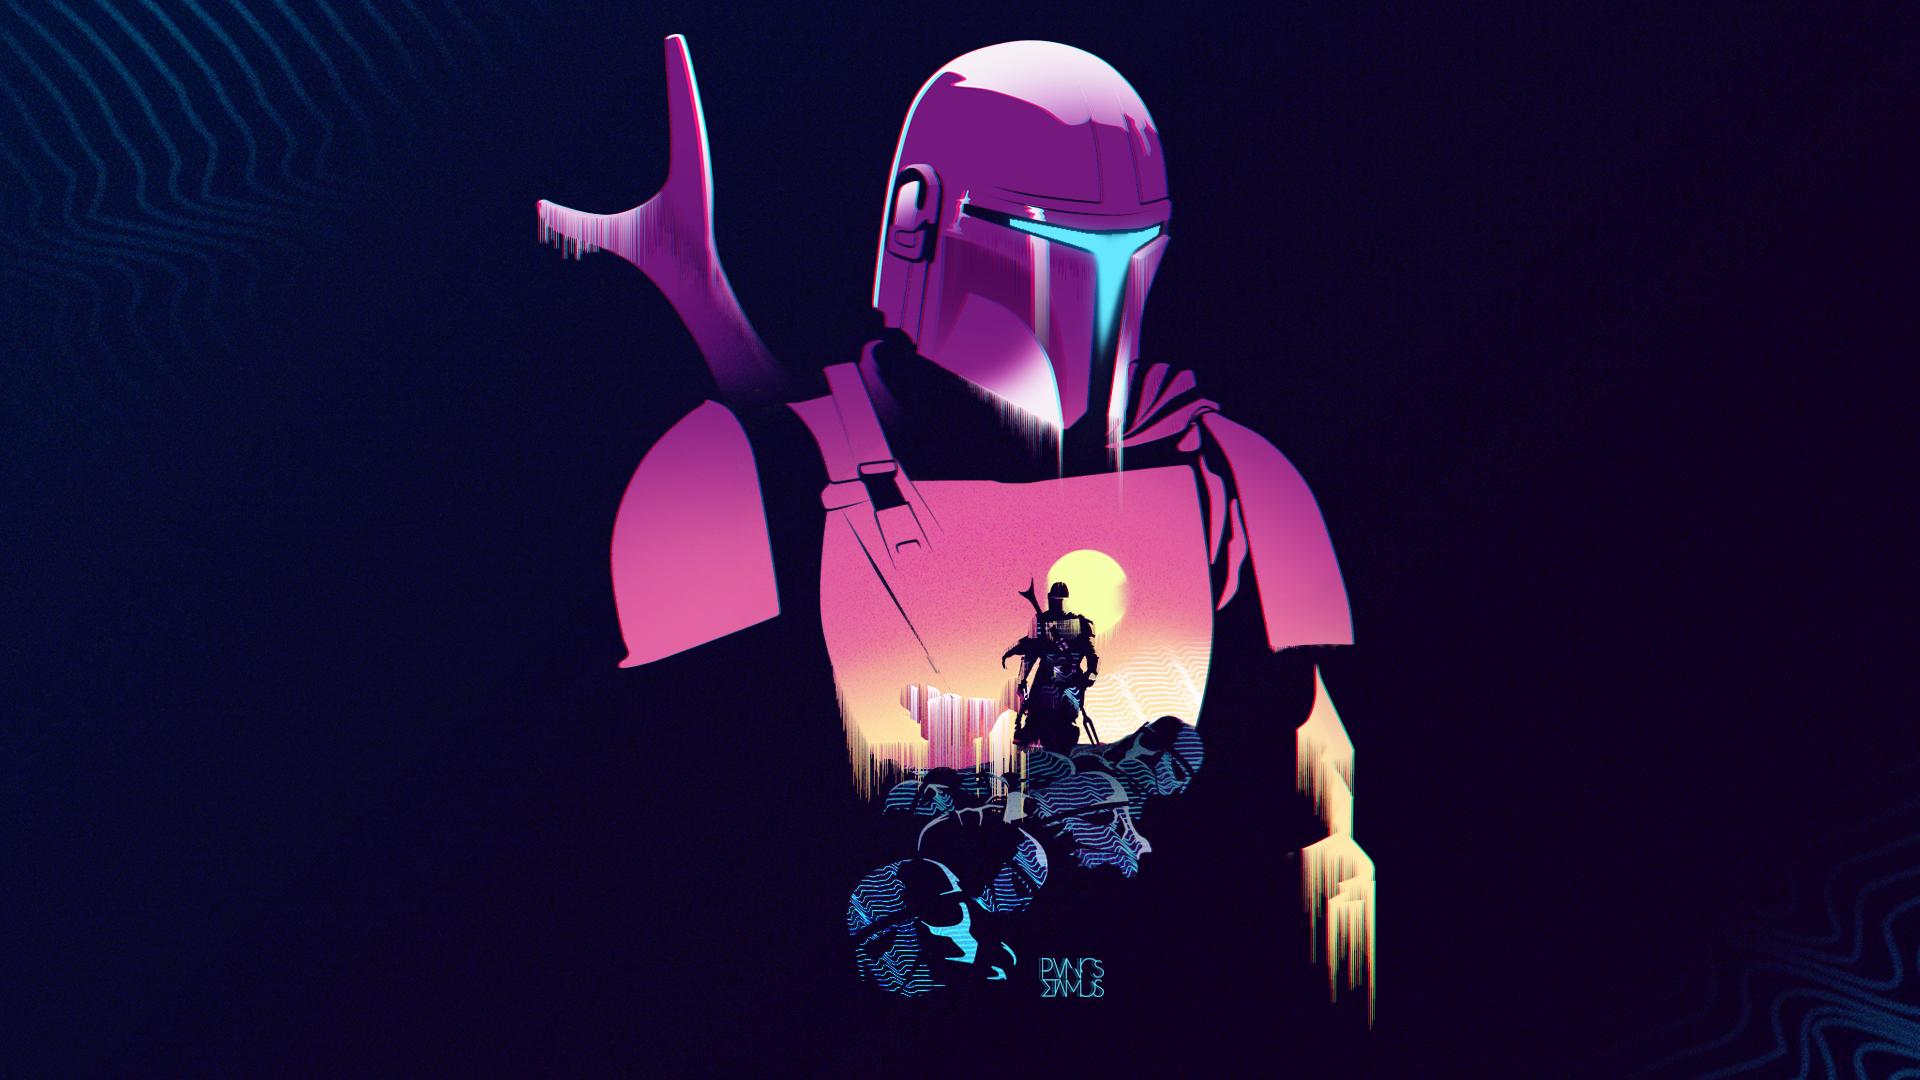 Mandalorians Star Wars cyberpunk futuristic cyber artwork punk Baby Yoda tv series PanosStamo pink orange stormtrooper 1829781